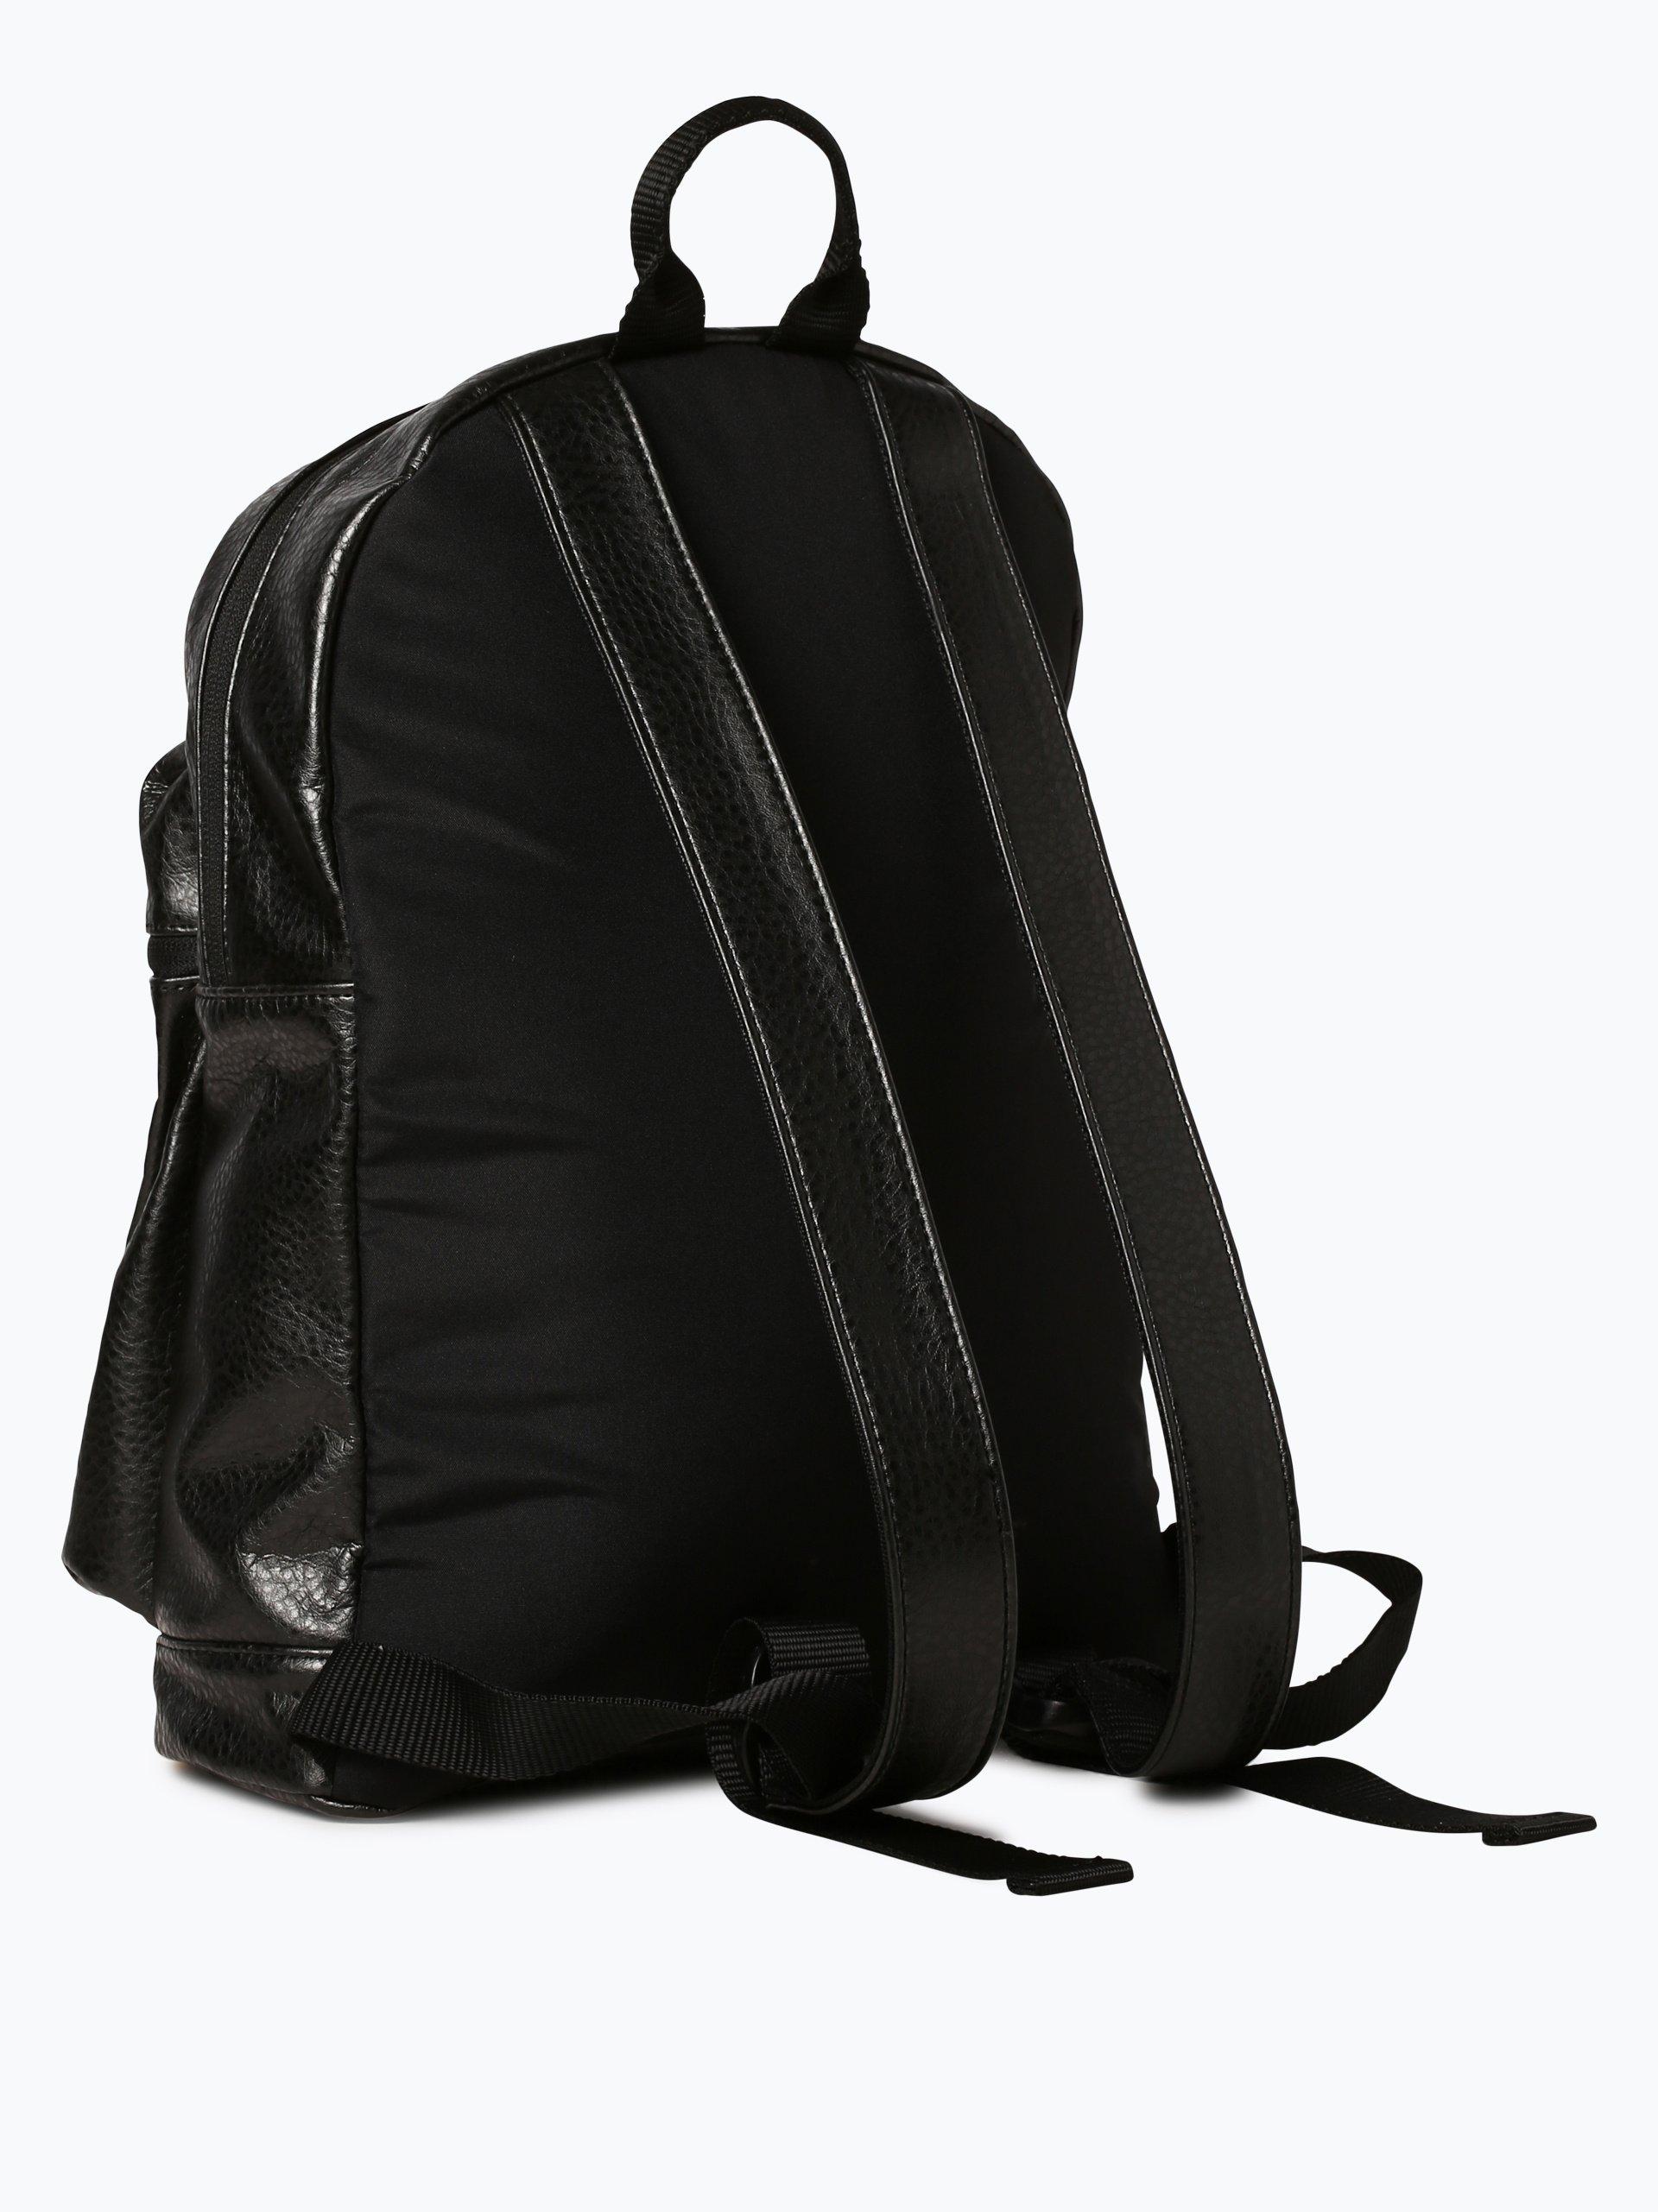 puma damen rucksack schwarz bedruckt online kaufen vangraaf com. Black Bedroom Furniture Sets. Home Design Ideas